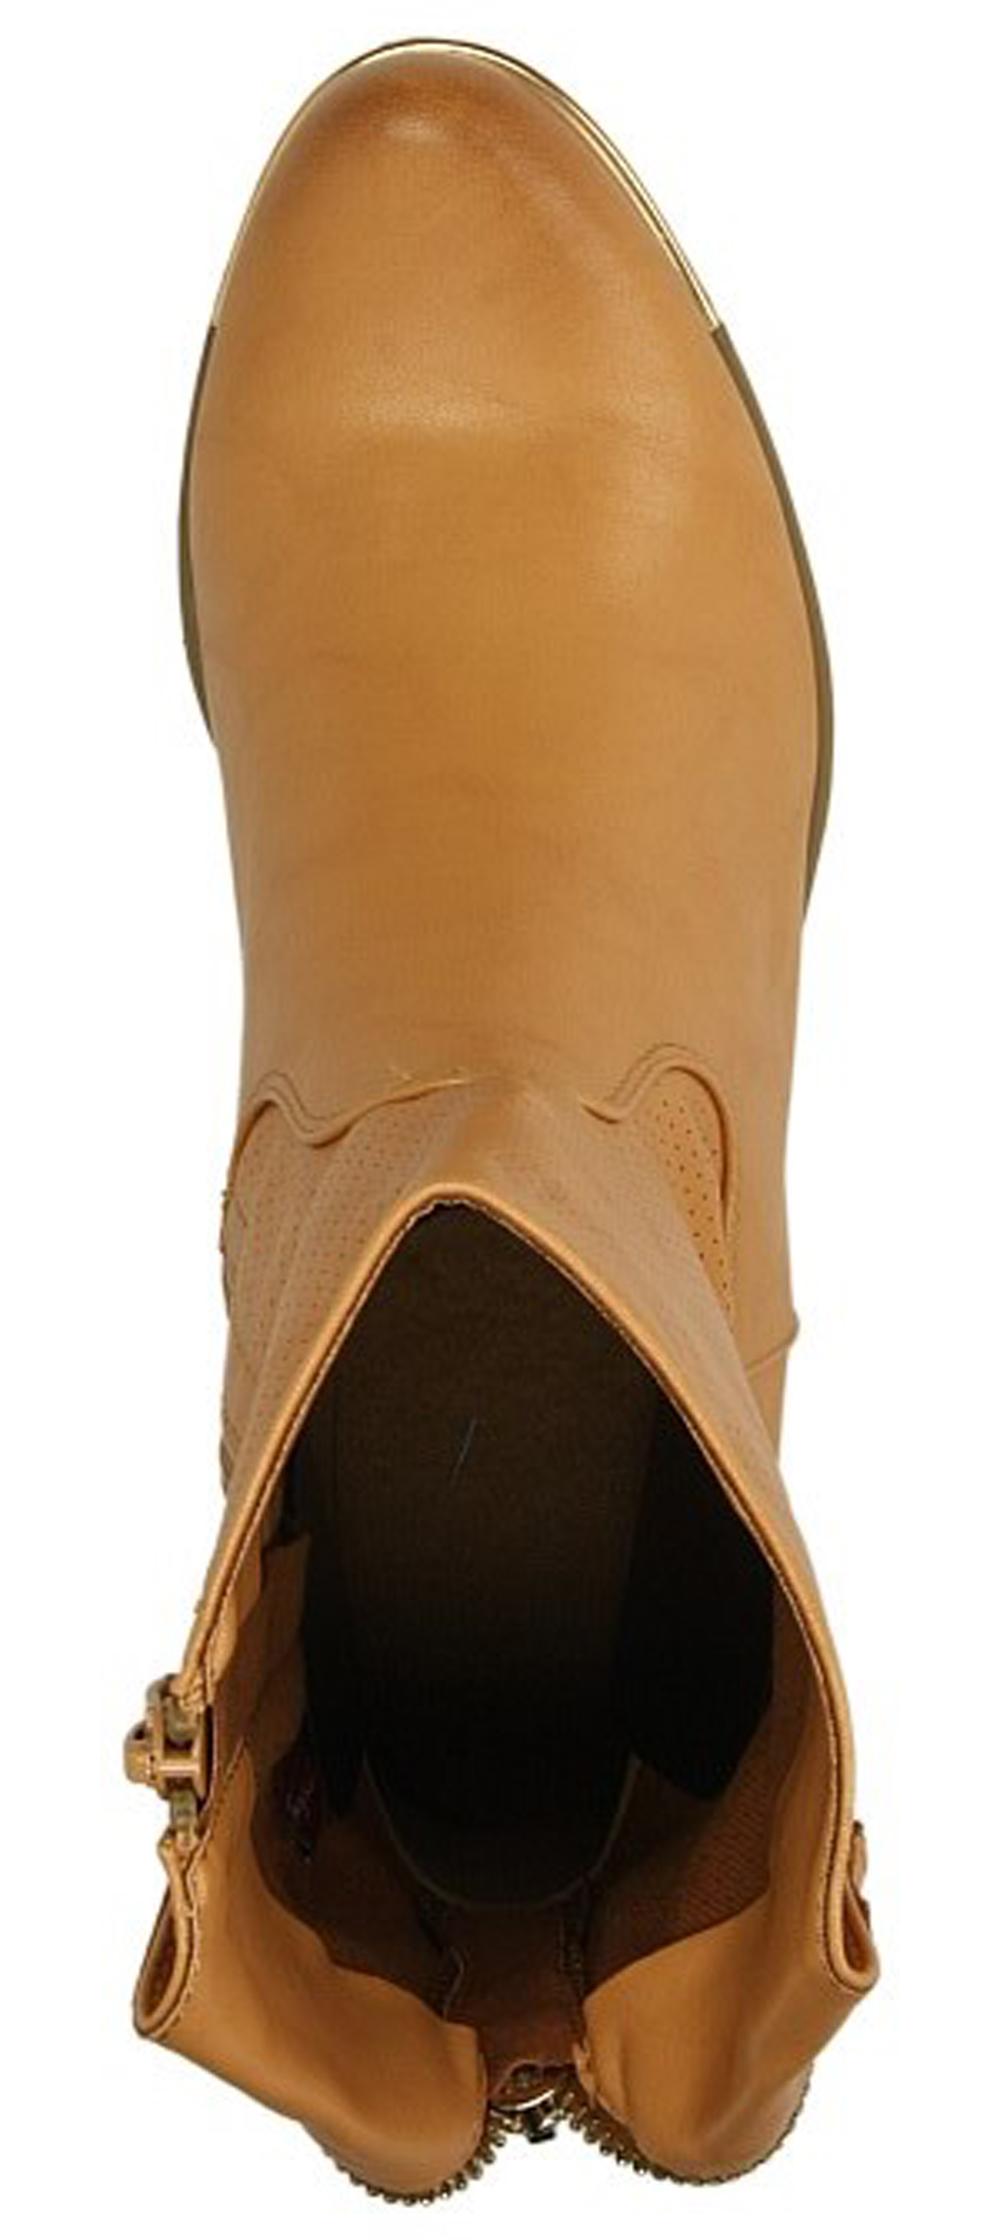 BOTKI SERGIO LEONE 5010 kolor camel